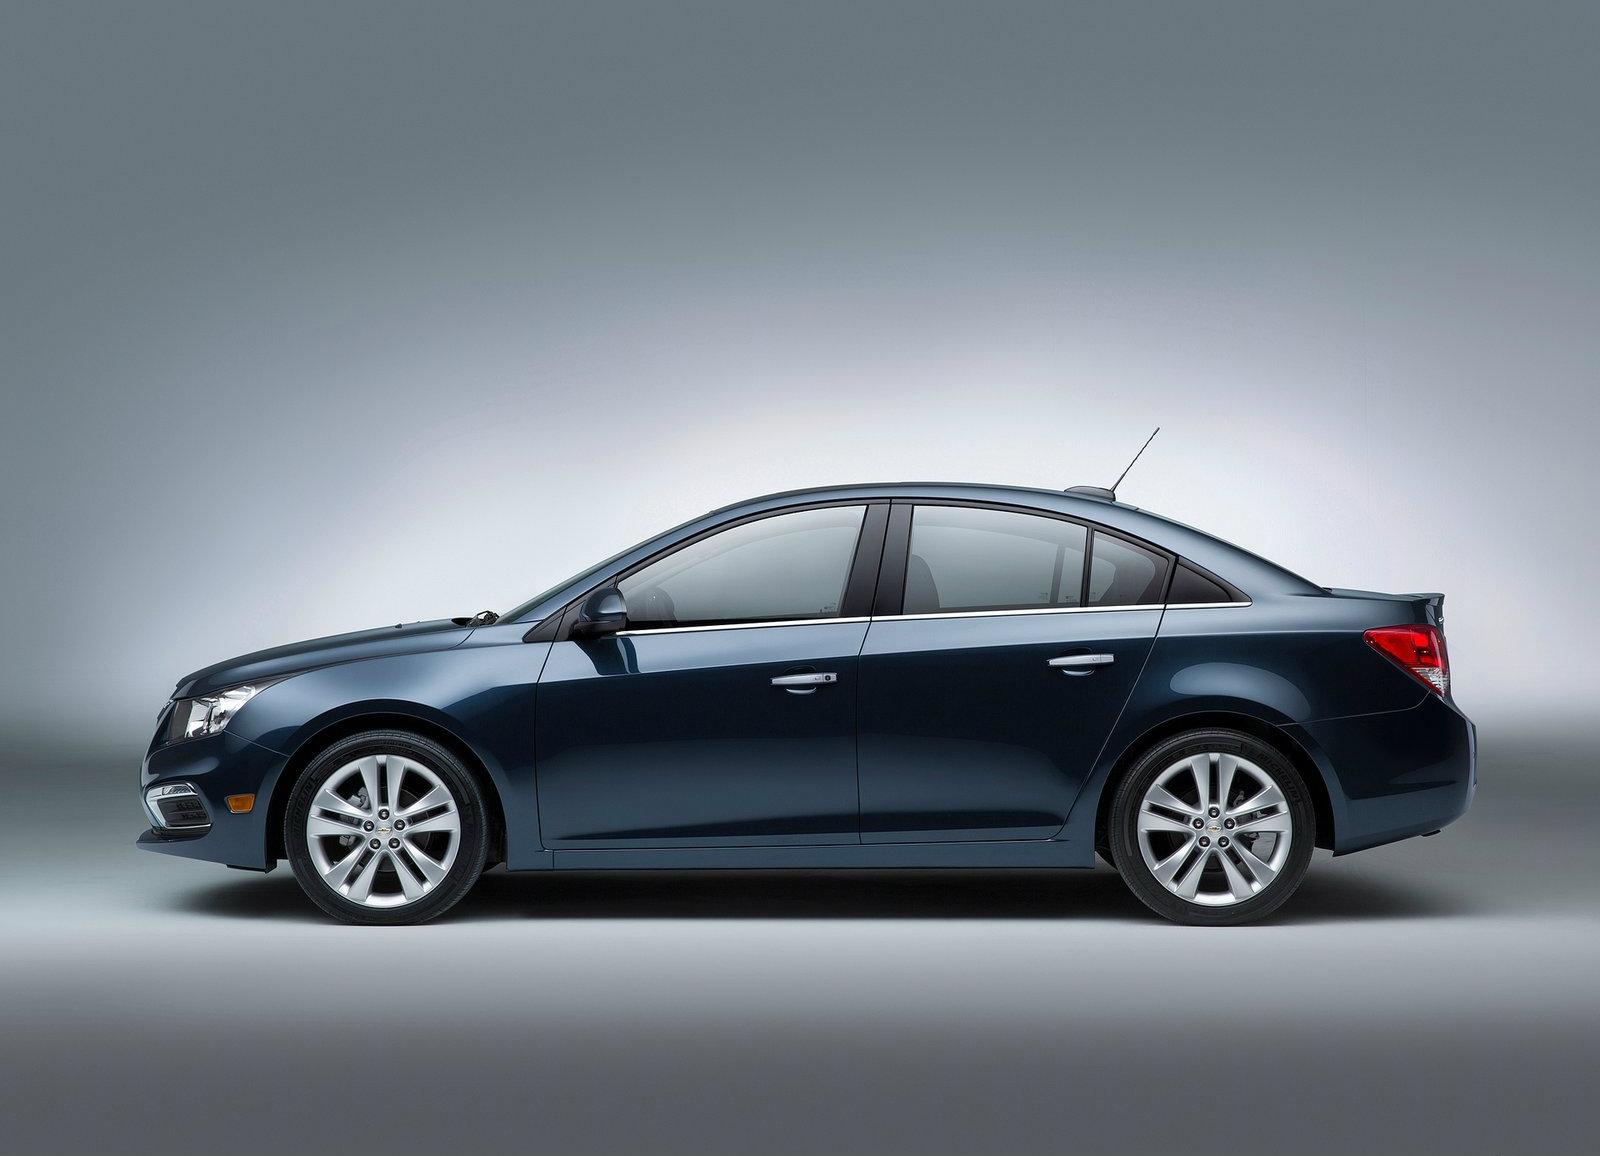 Chevrolet Cruze I Restyling 2012 - 2015 Station wagon 5 door #6